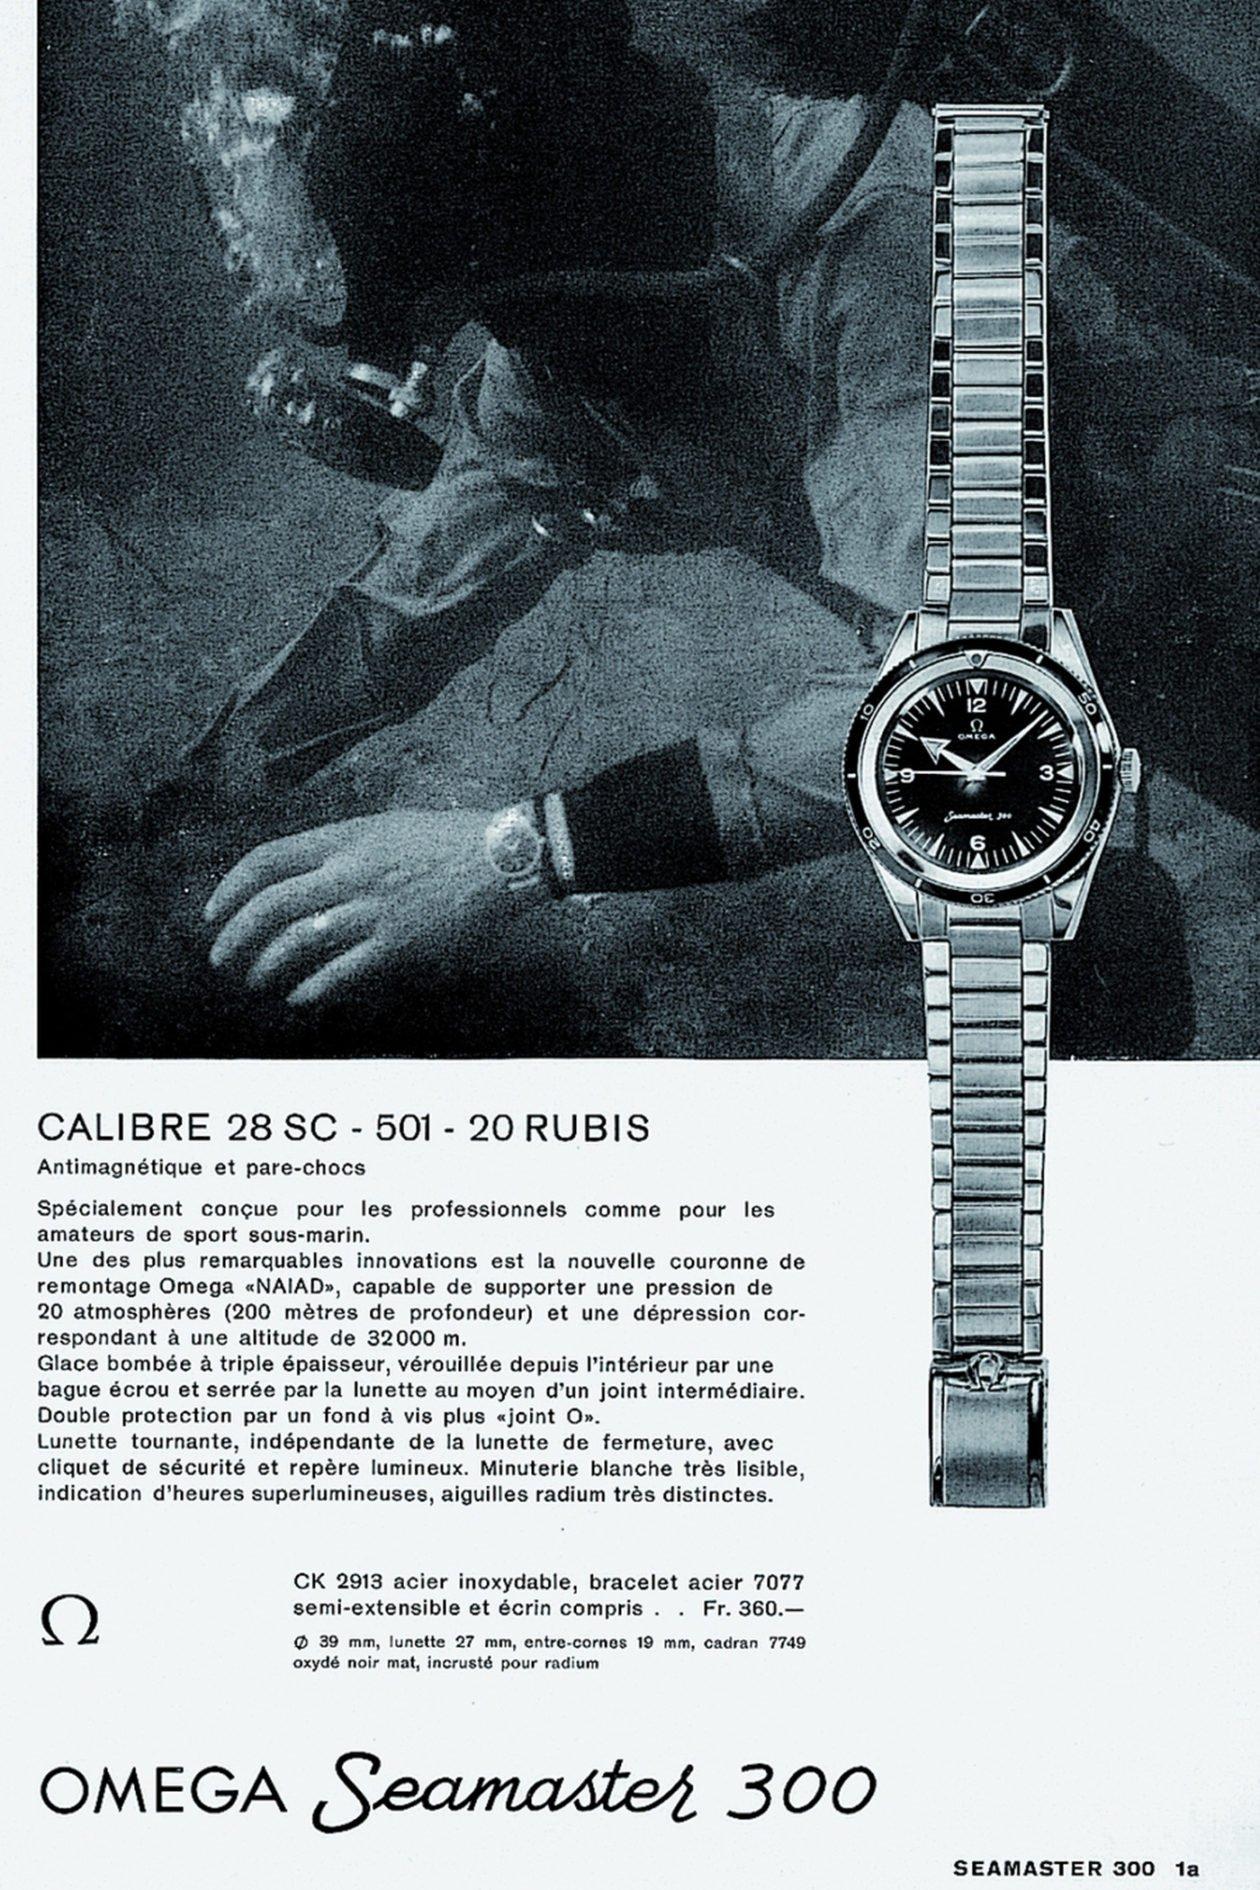 Omega Seamaster 300 - reklama z 1958 roku